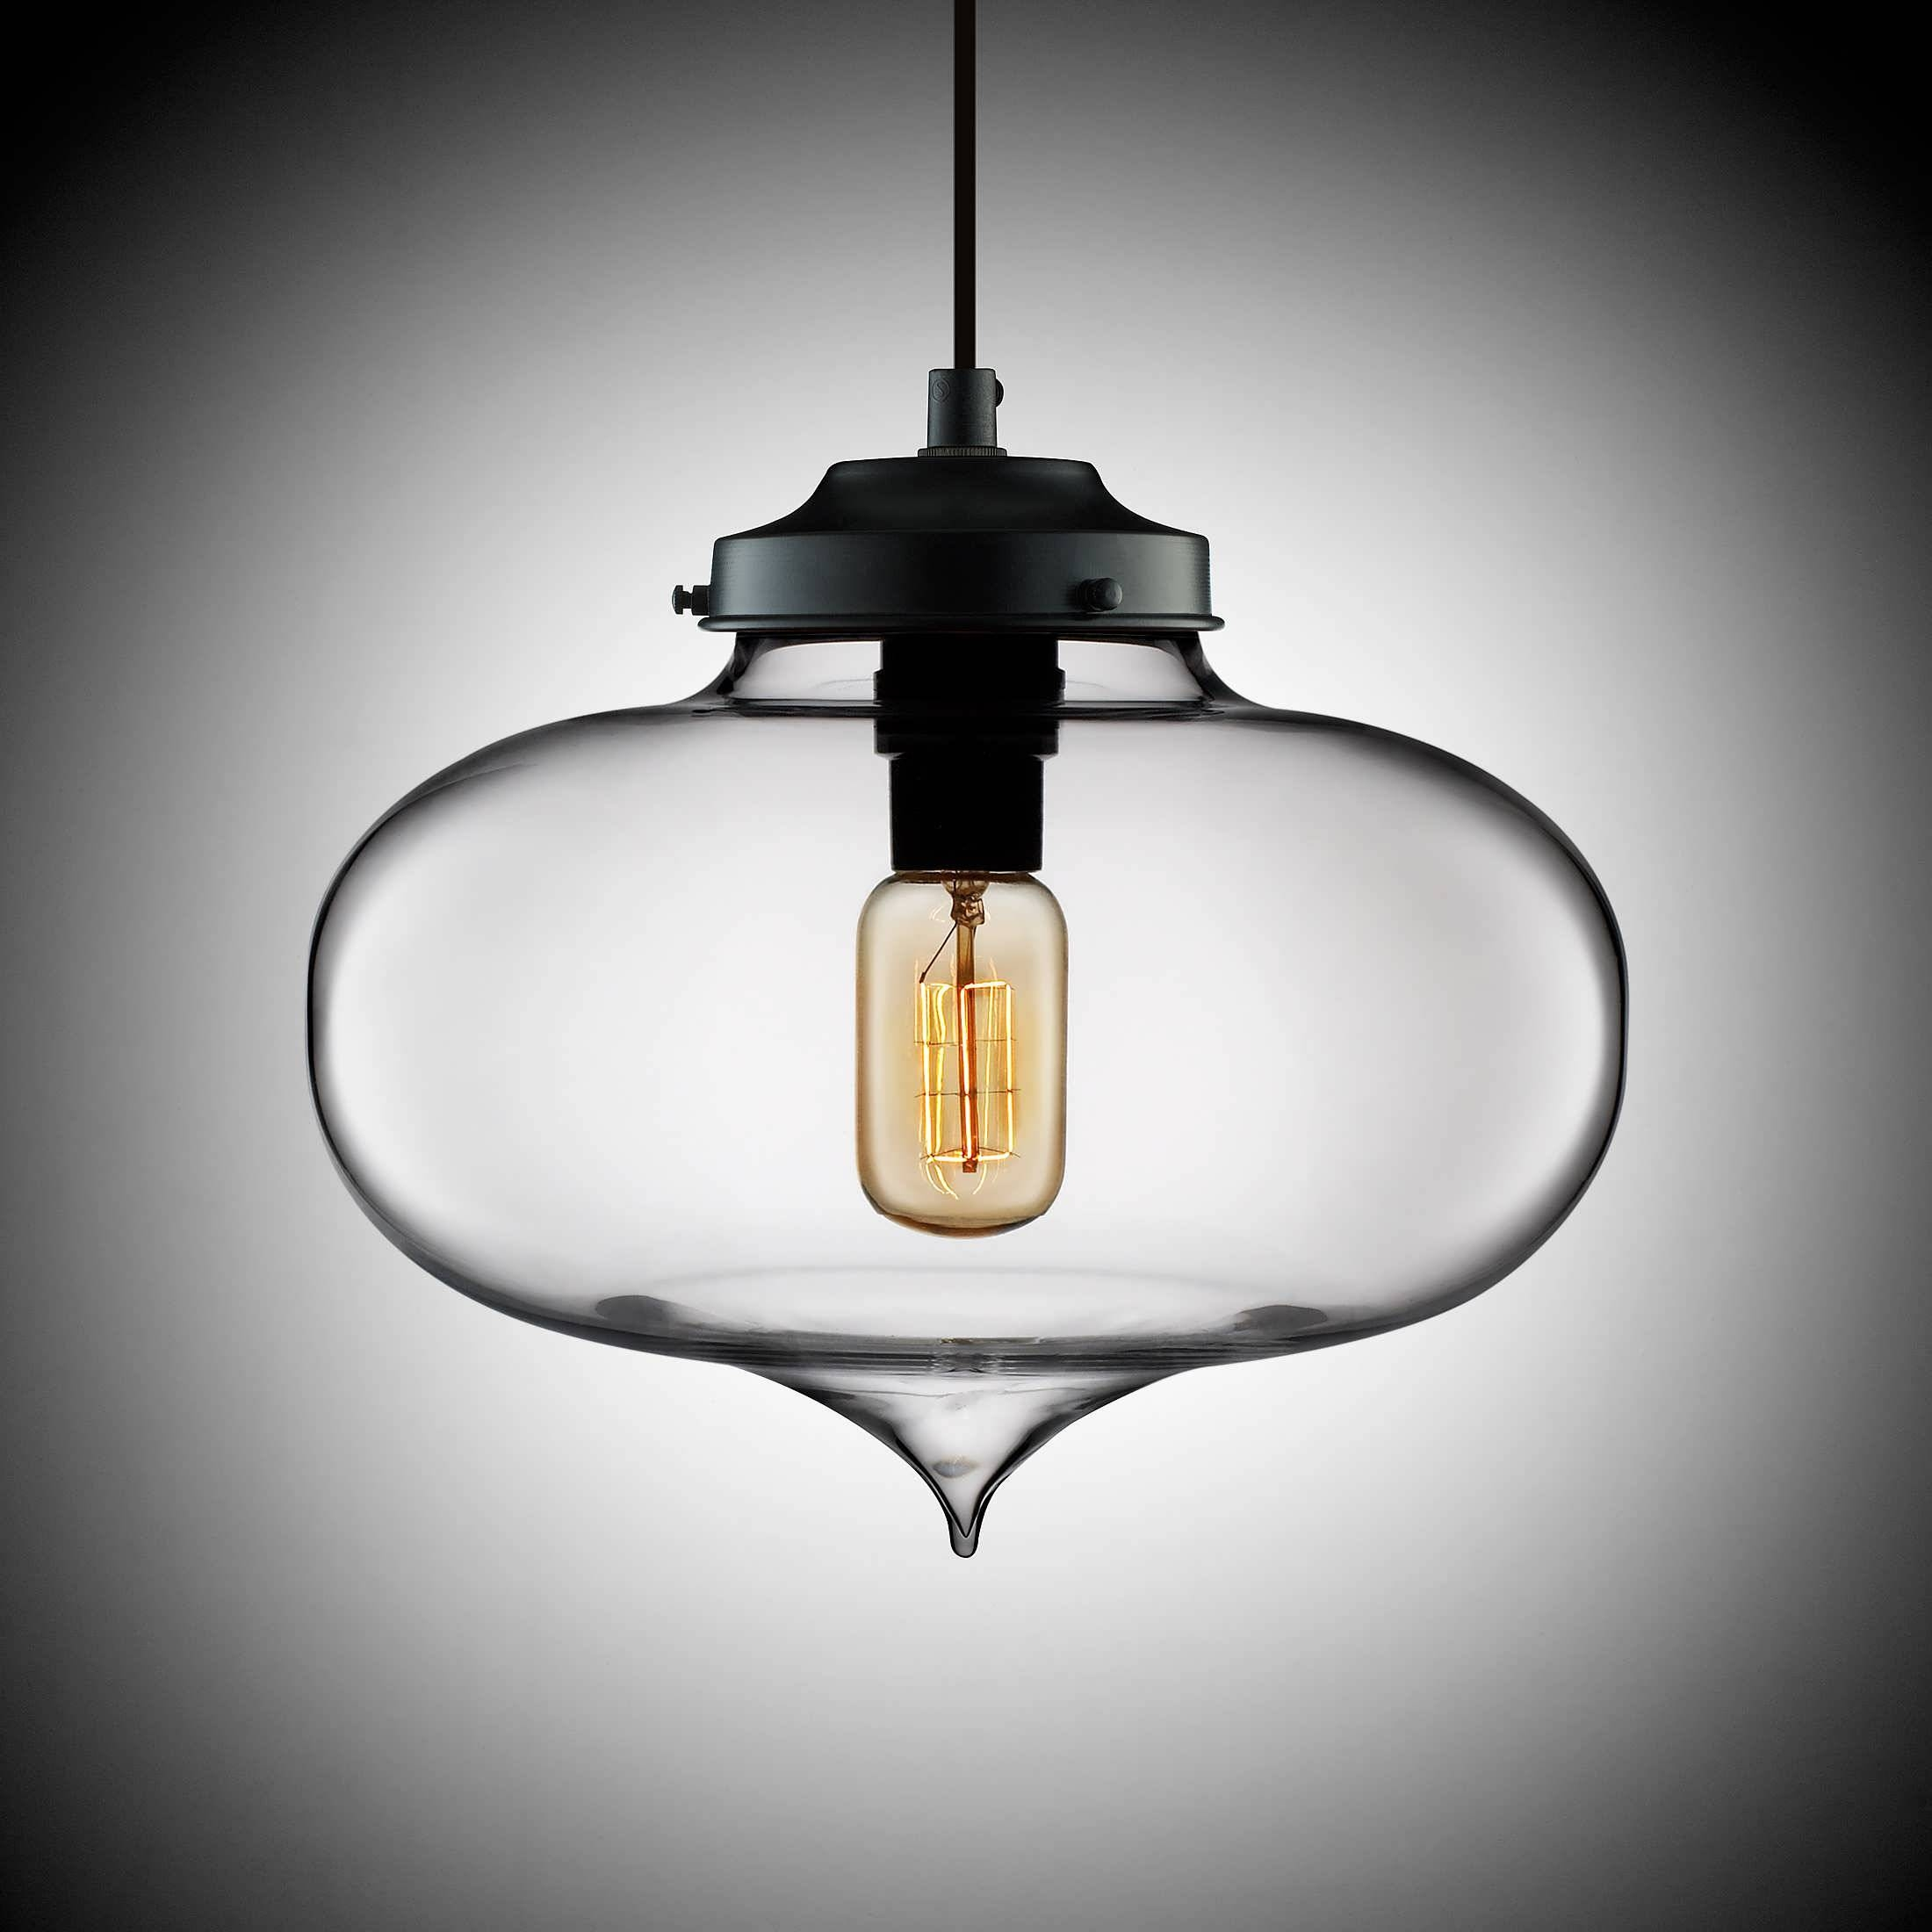 Chandelier : Star Pendant Light Kitchen Pendant Lighting Dining in Square Pendant Light Fixtures (Image 4 of 15)